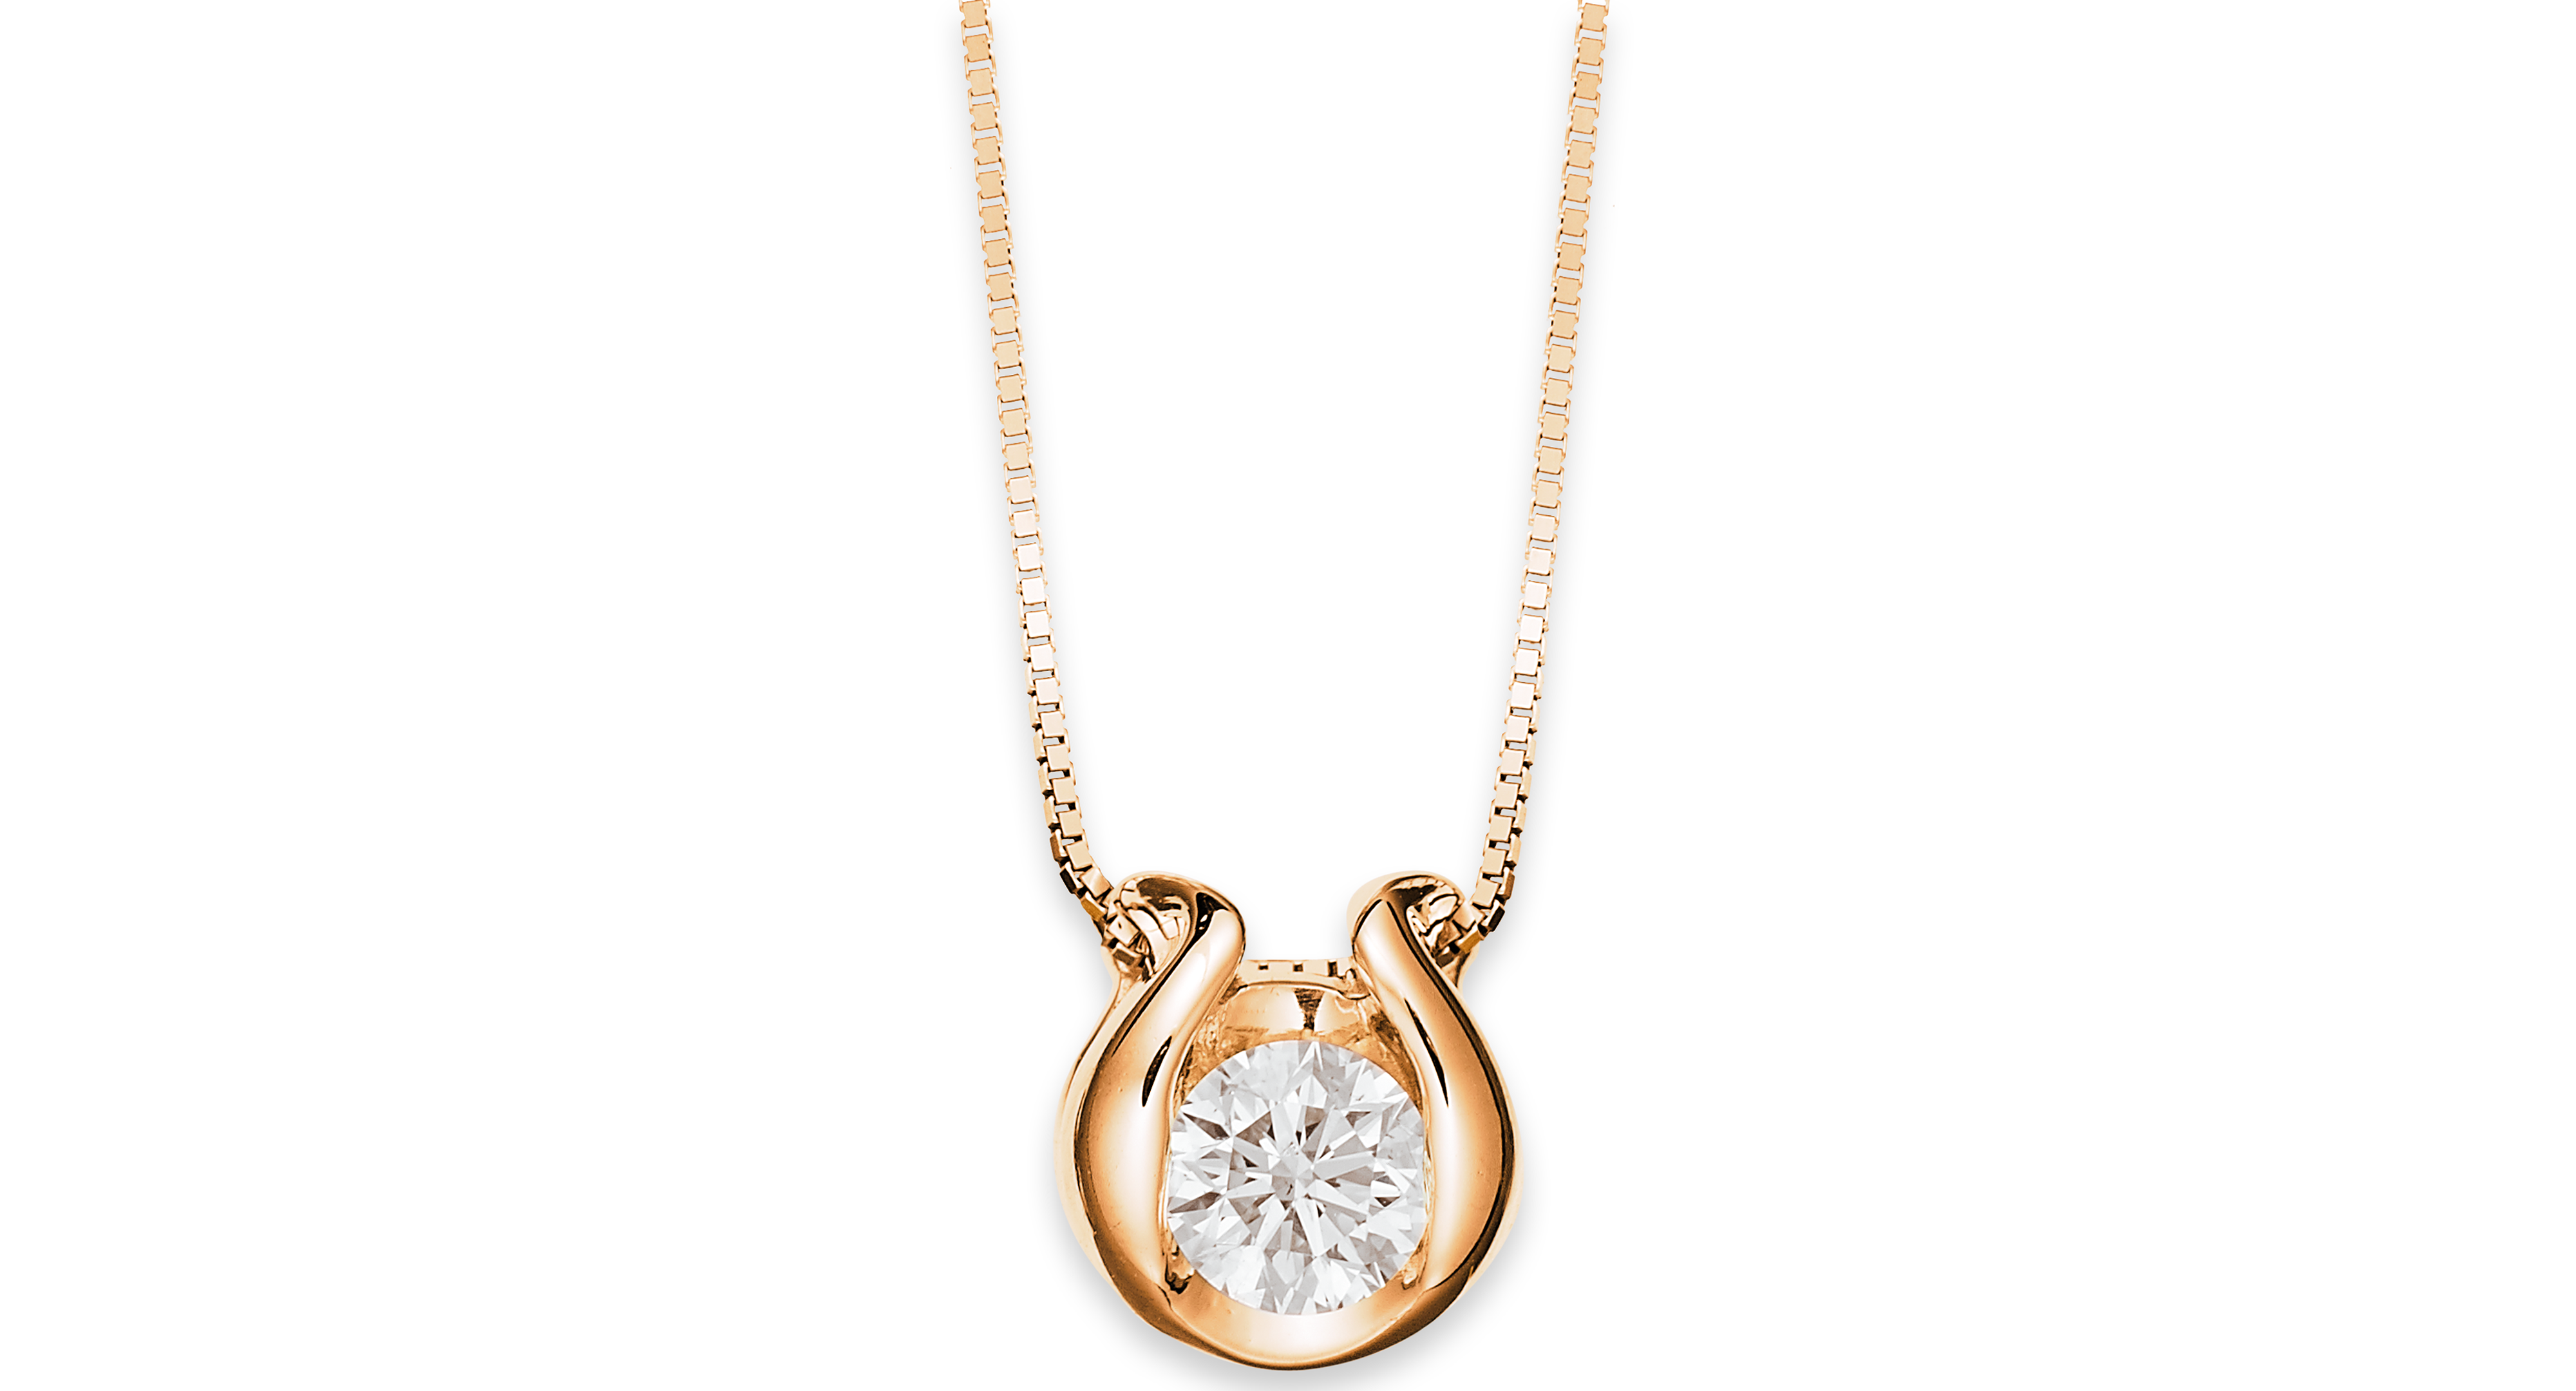 Sirena k gold necklace bezelset diamond accent pendant